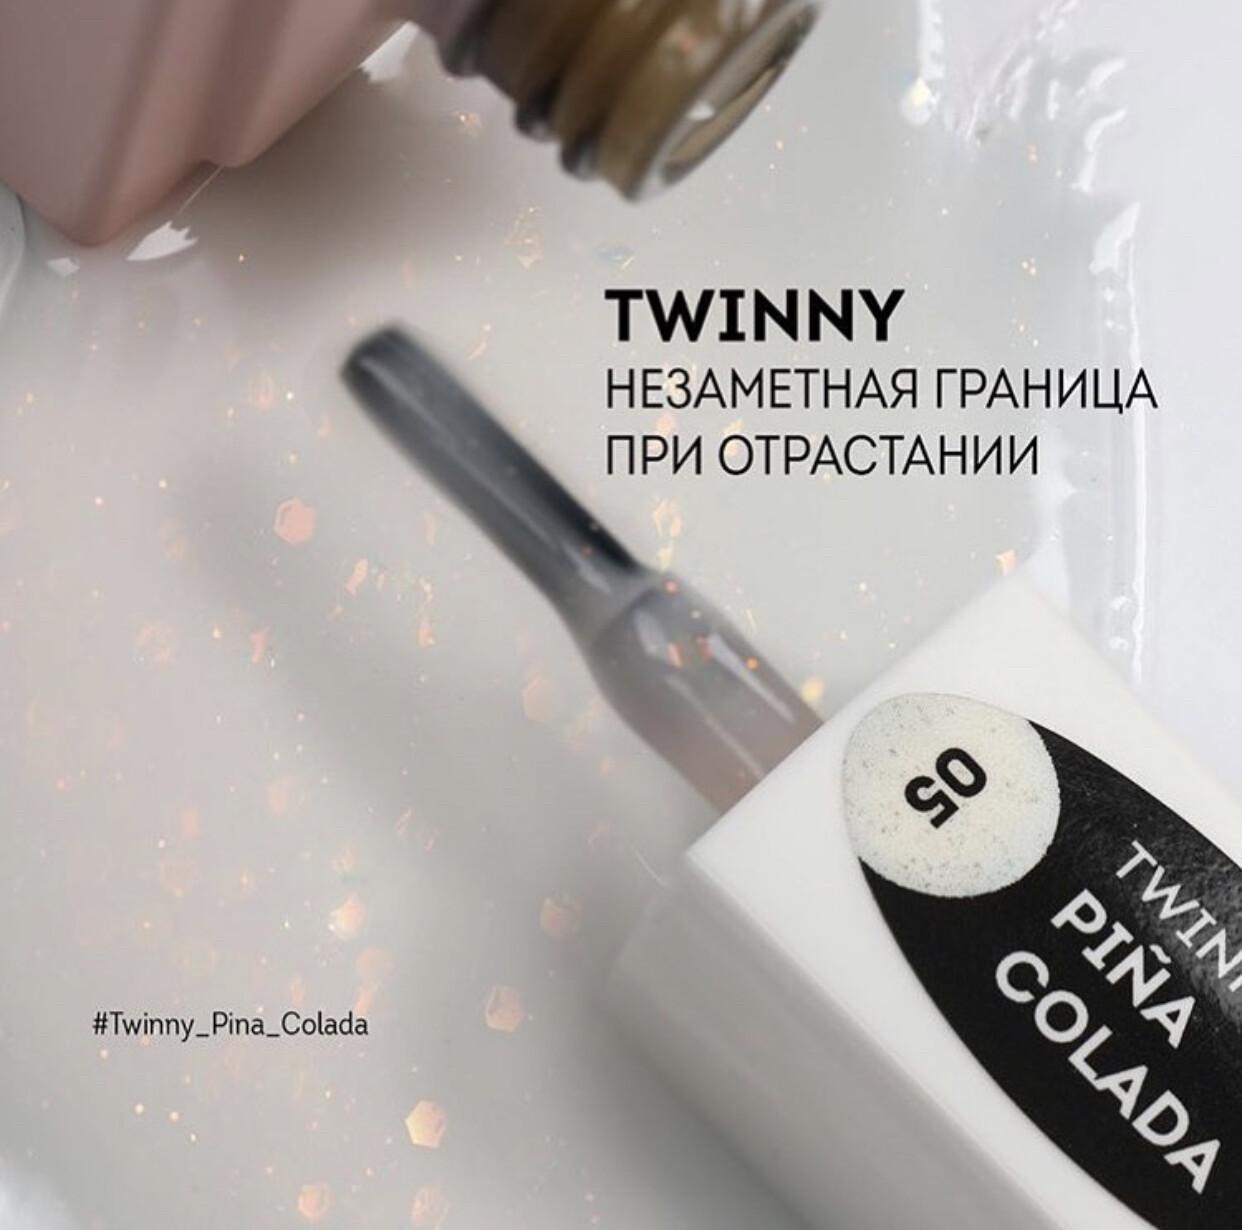 E.MiLac Twinny rubber base Piña Colada #05, 9 ml